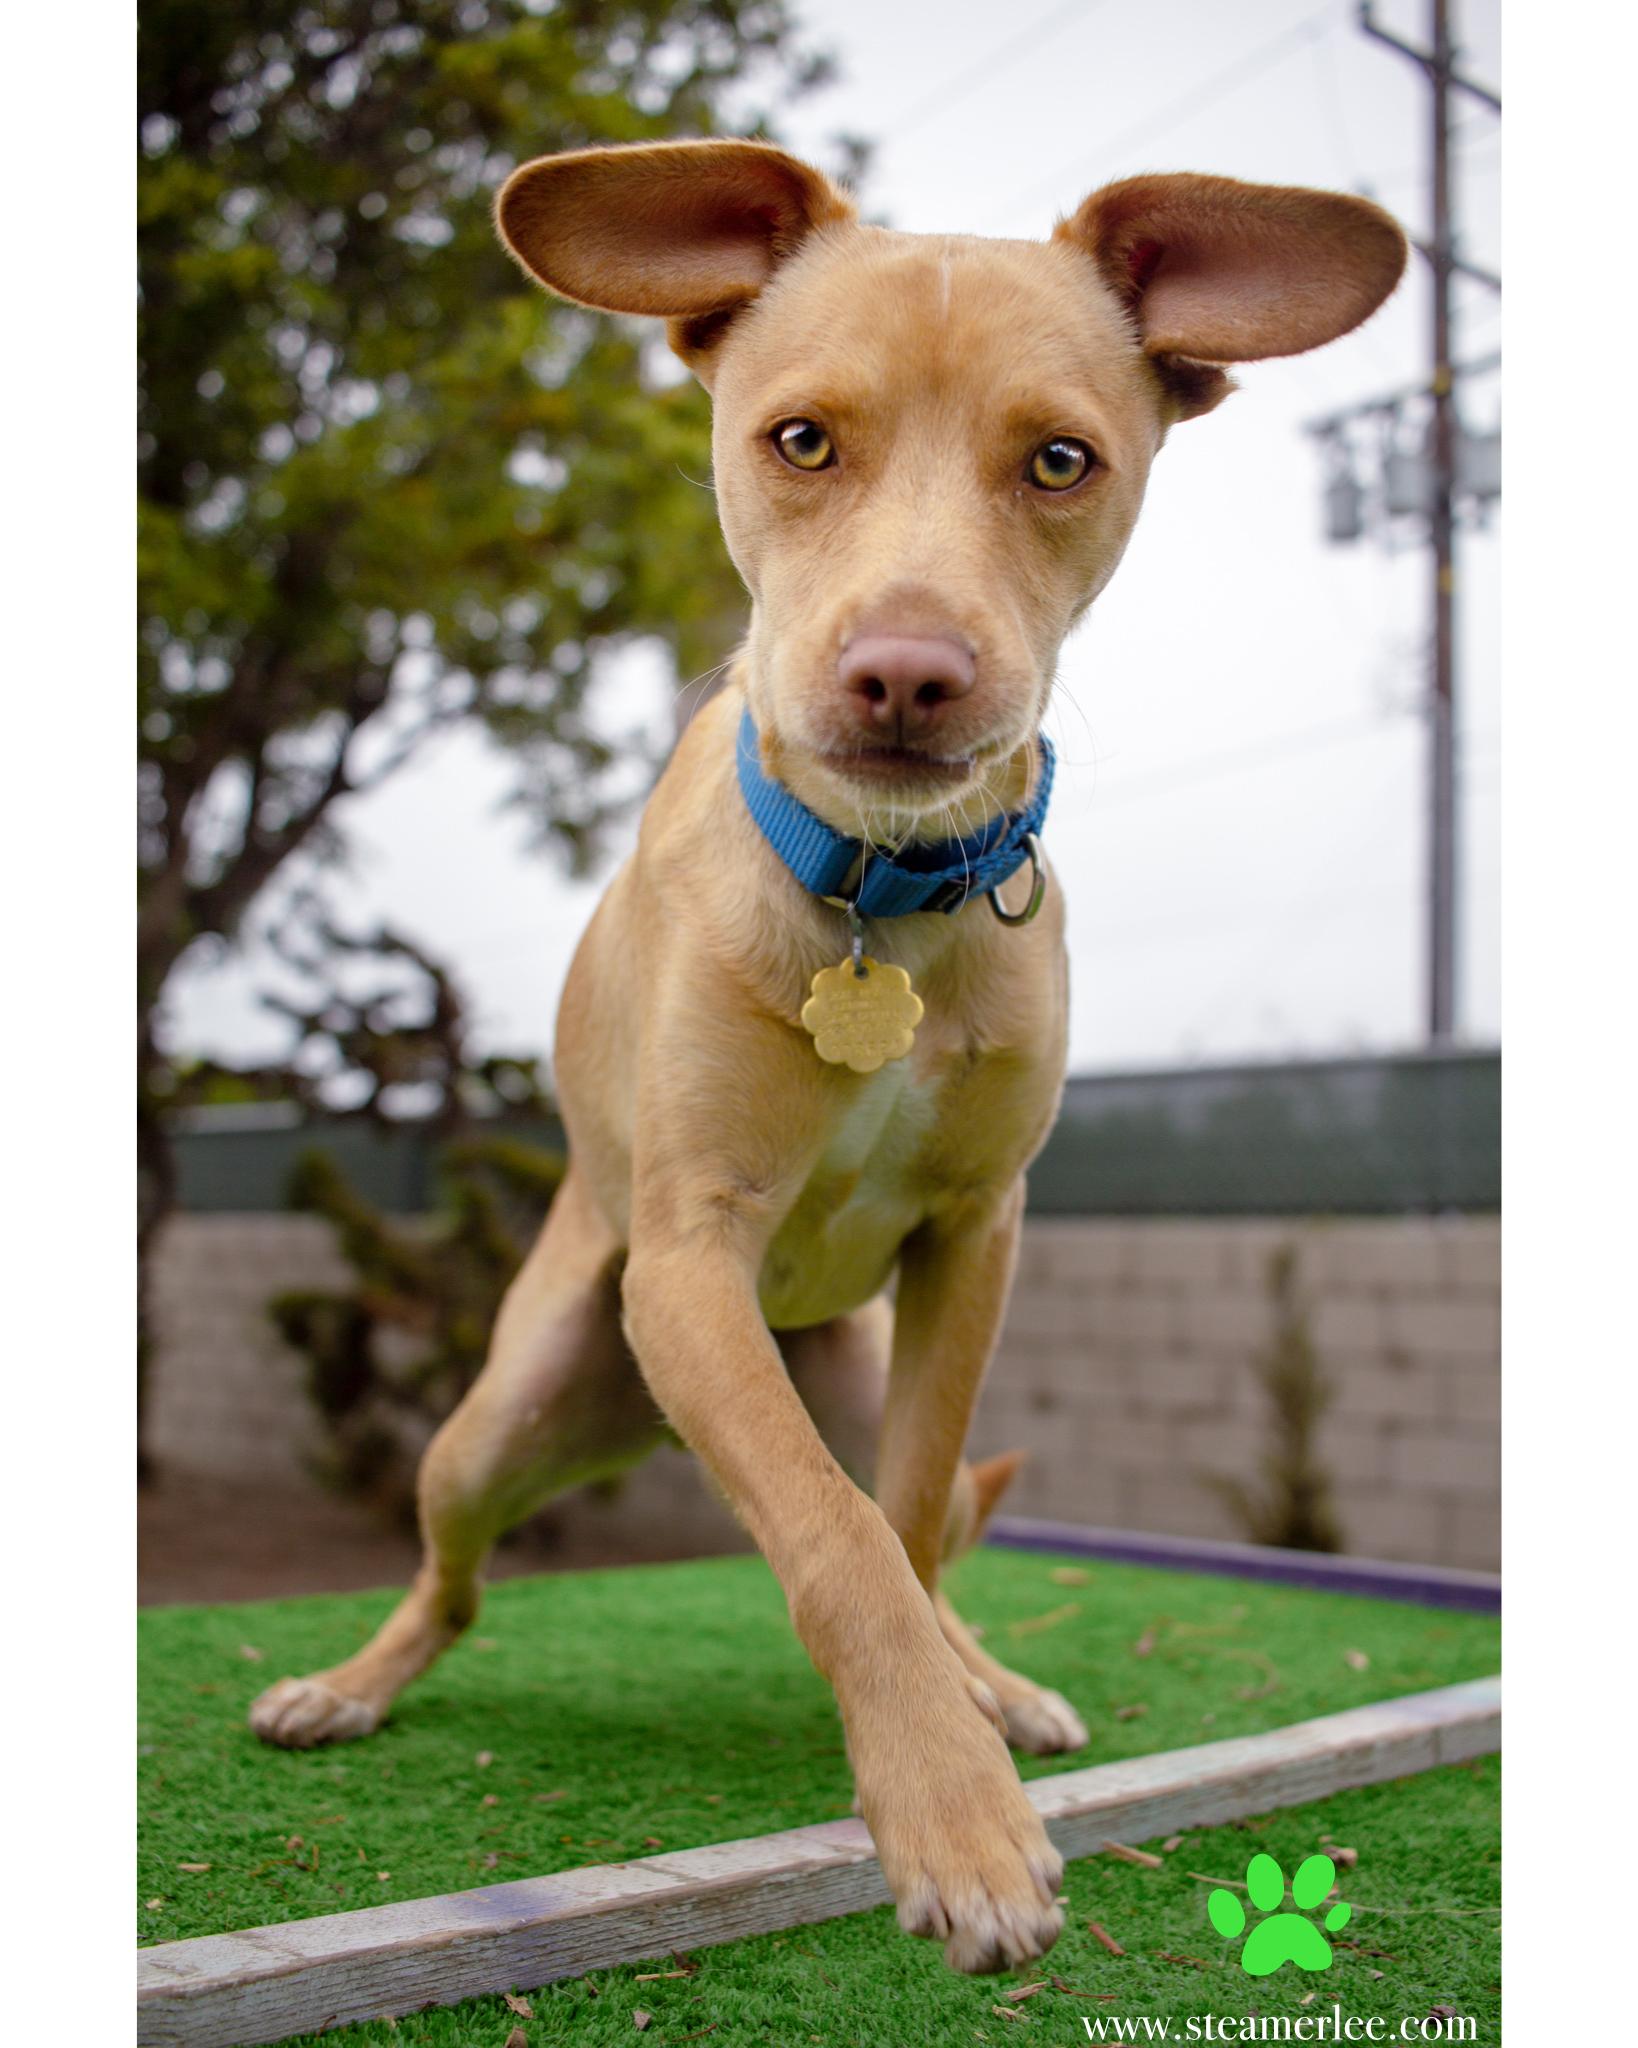 424-Orange-County-Dog-Photography-Steamer-Lee-Southern-California-SBACC.JPG